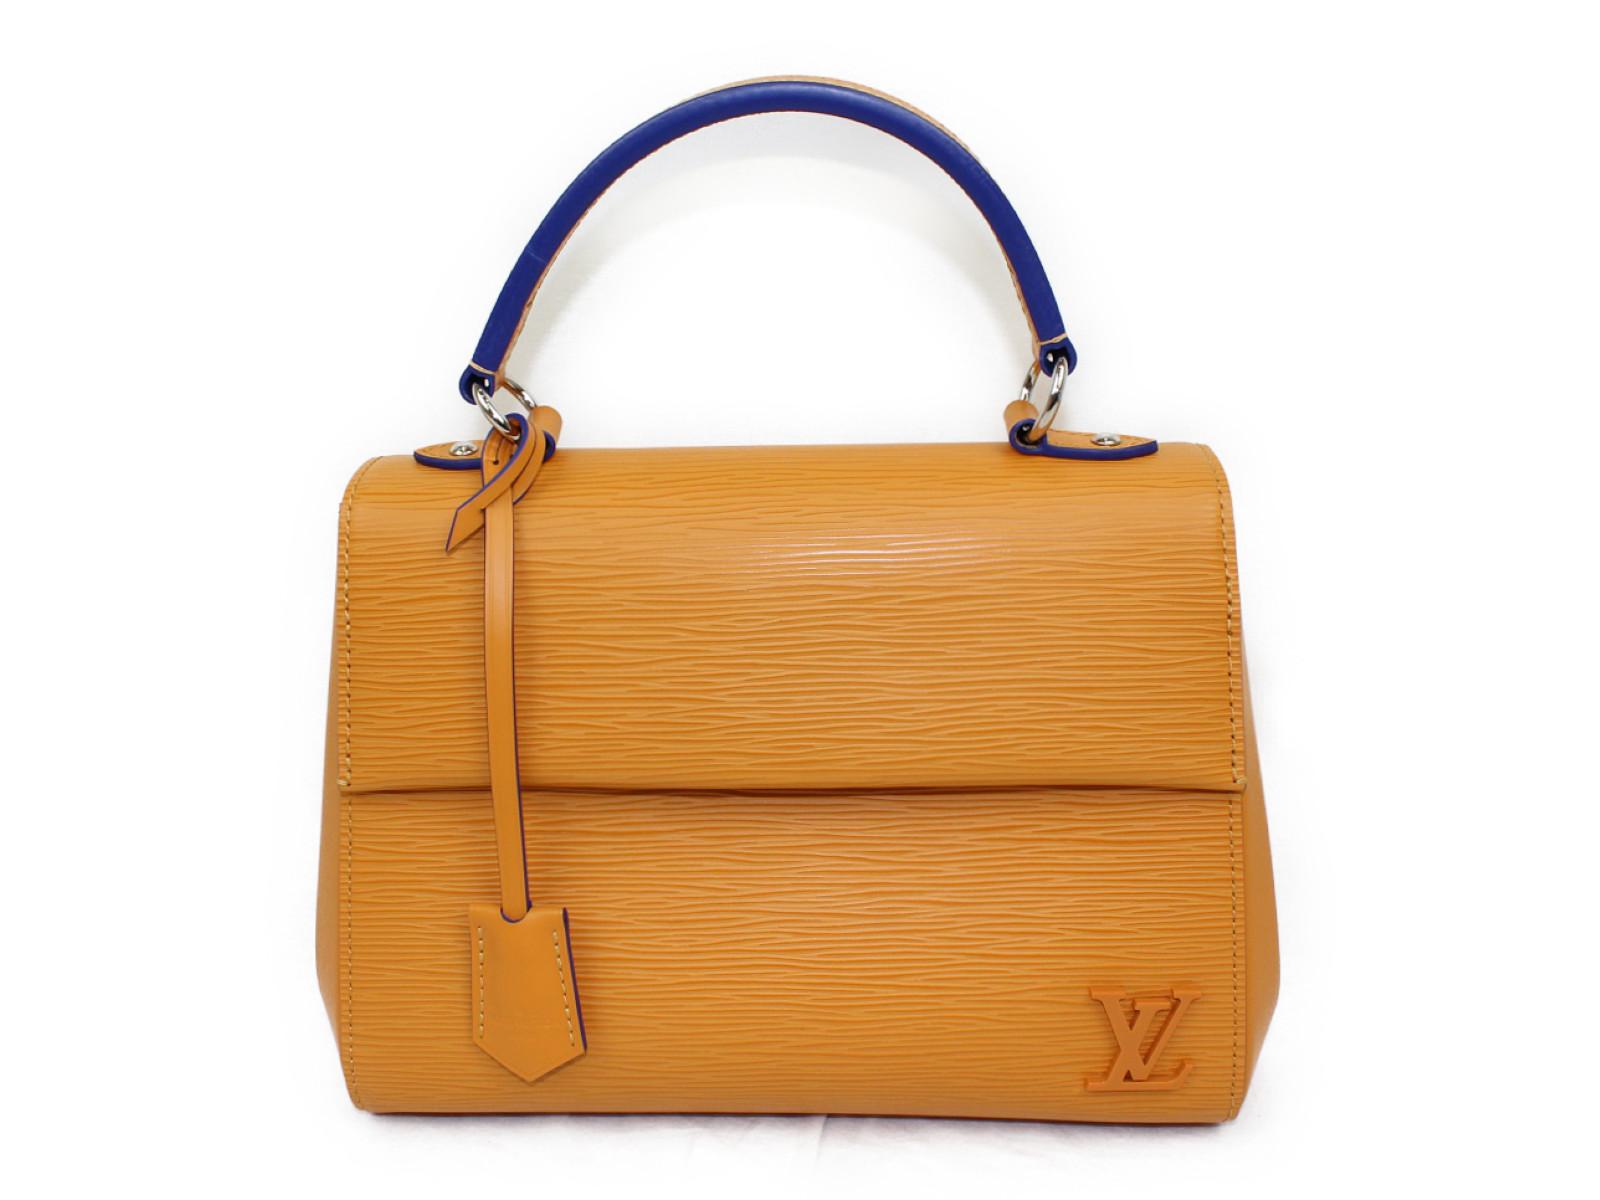 LOUIS VUITTON ルイヴィトンクリュニーBB M54168エピ 2WAYバッグ ショルダーバッグハンドバッグ シンプル オシャレプレゼント包装可【中古】